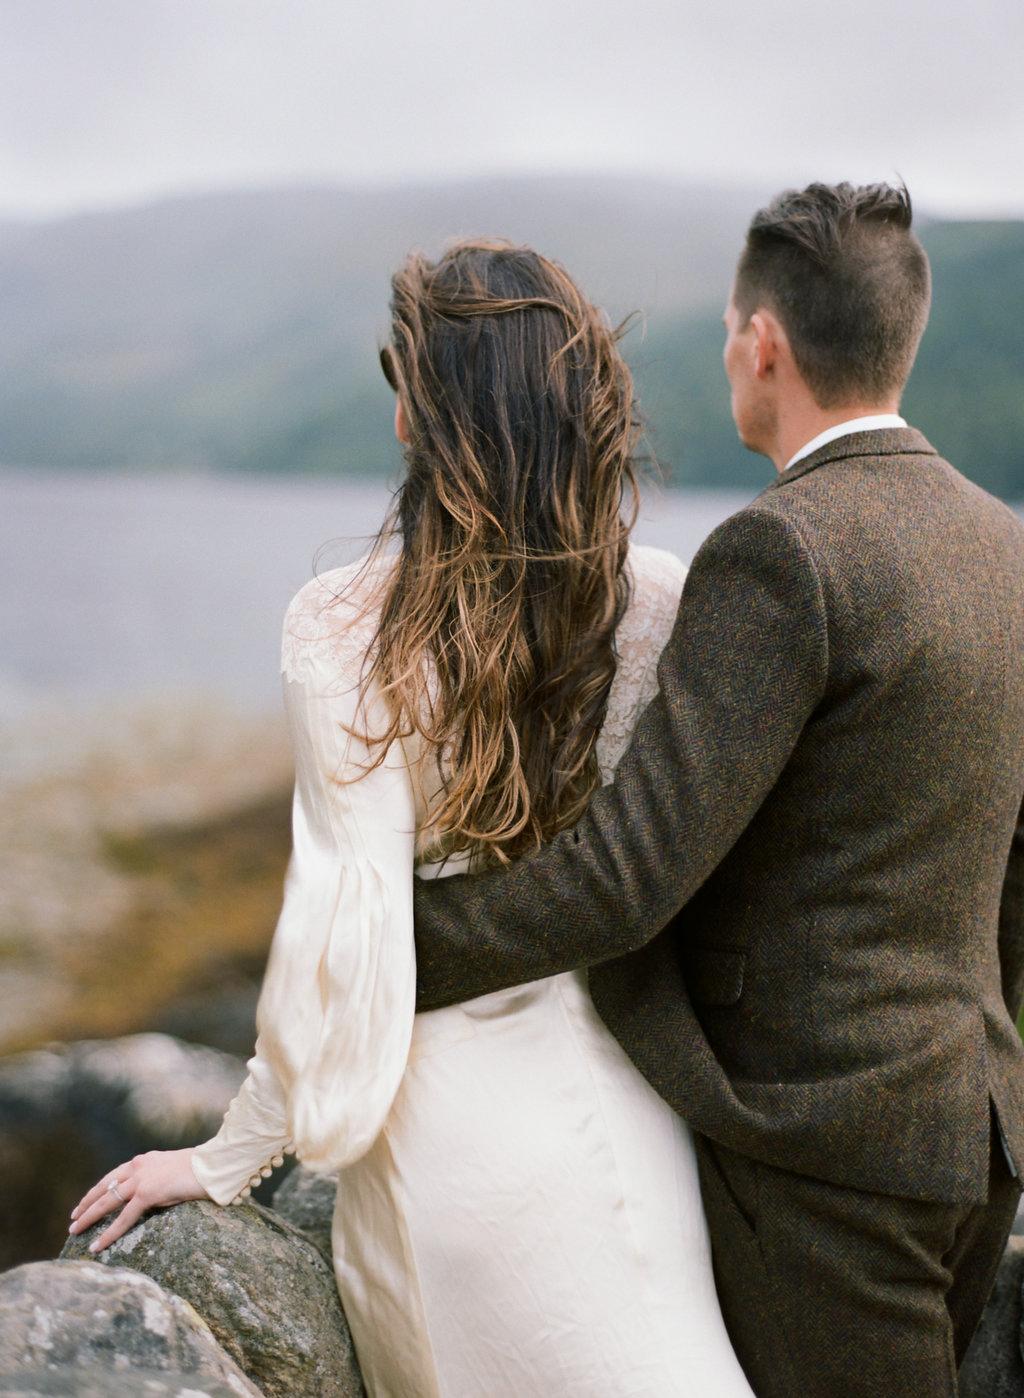 Scotland-Prewedding-highlands-castle-Engagment-Photos-Katie-Grant (128 of 139).jpg